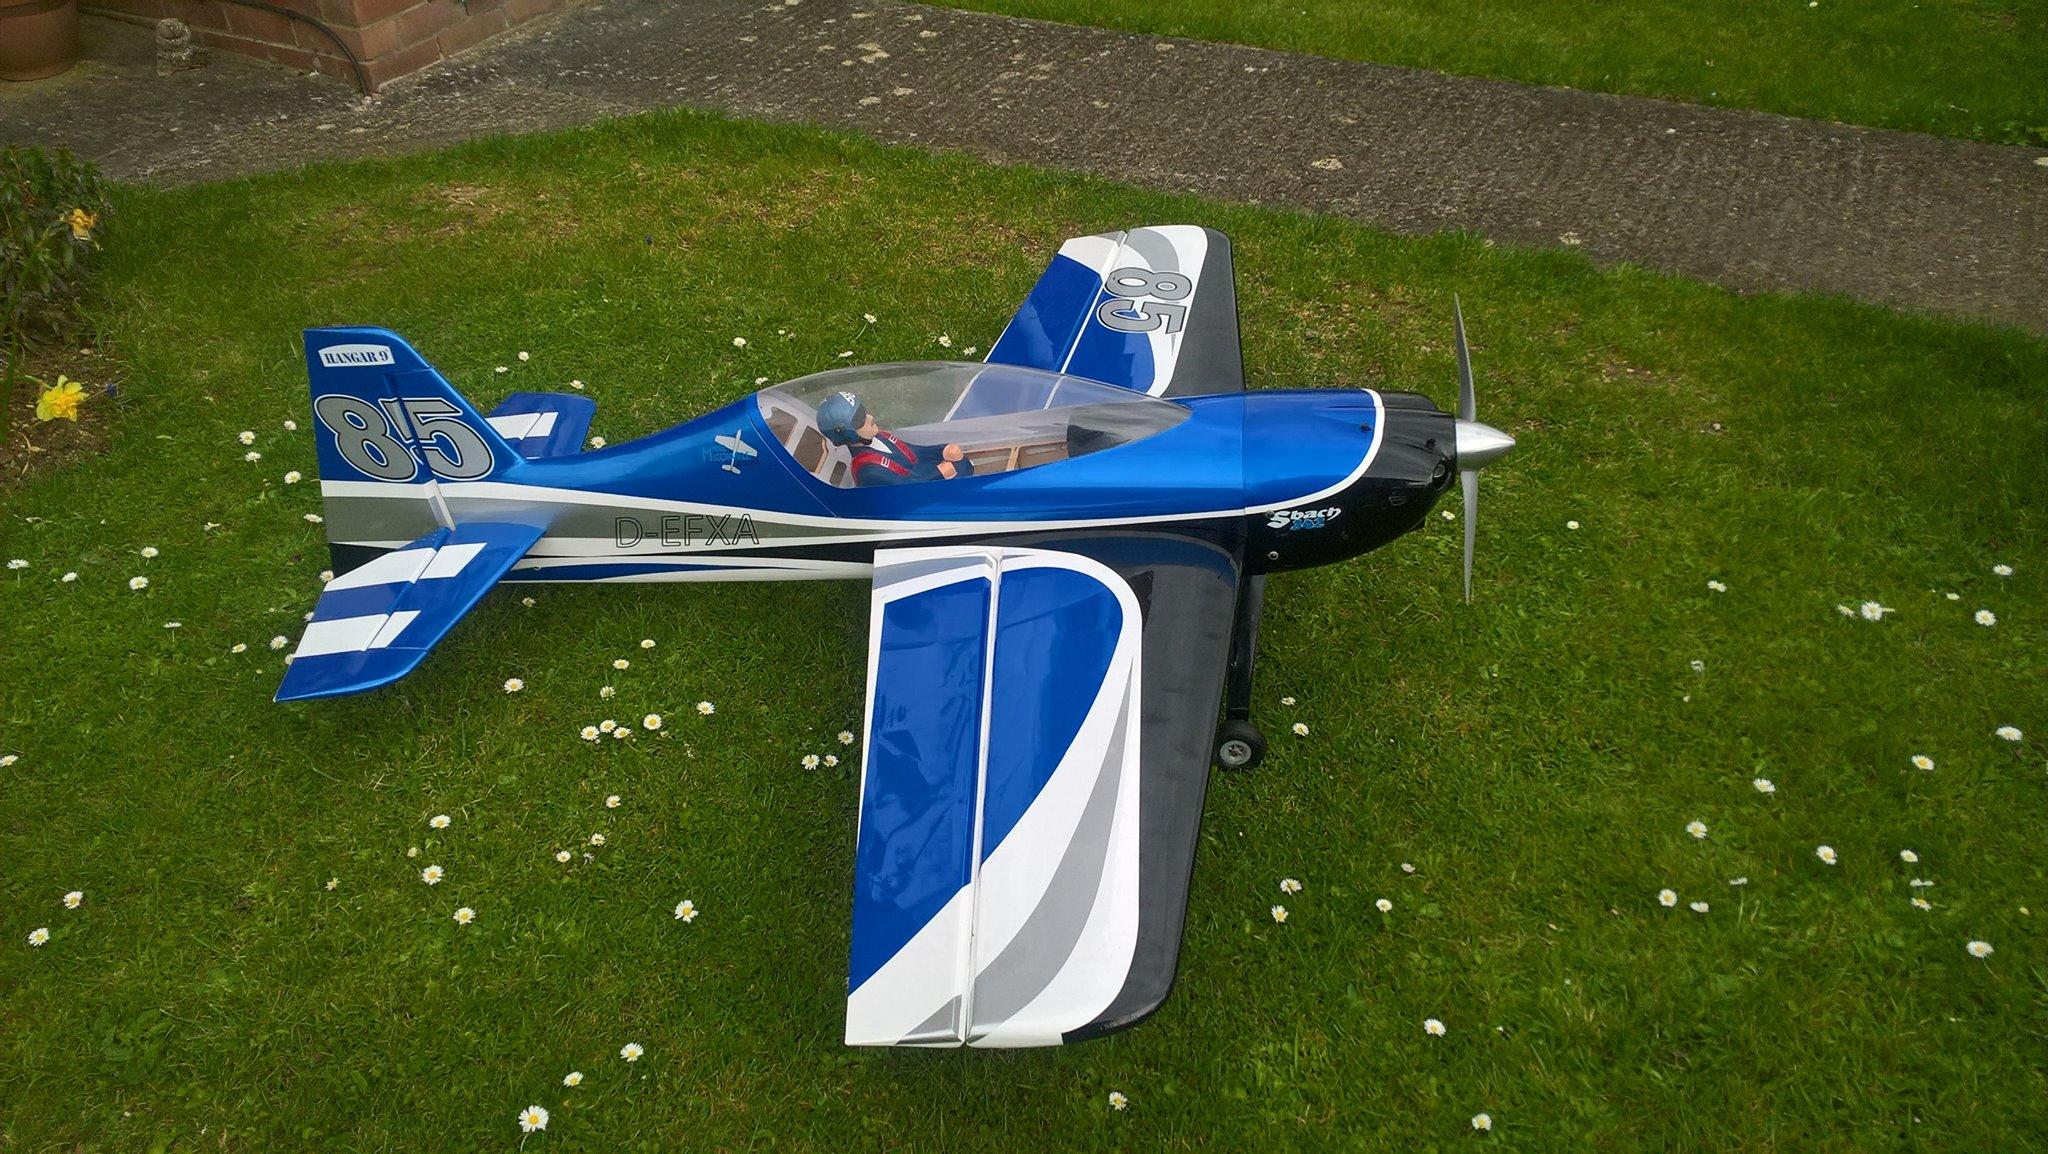 richard_blue_plane1